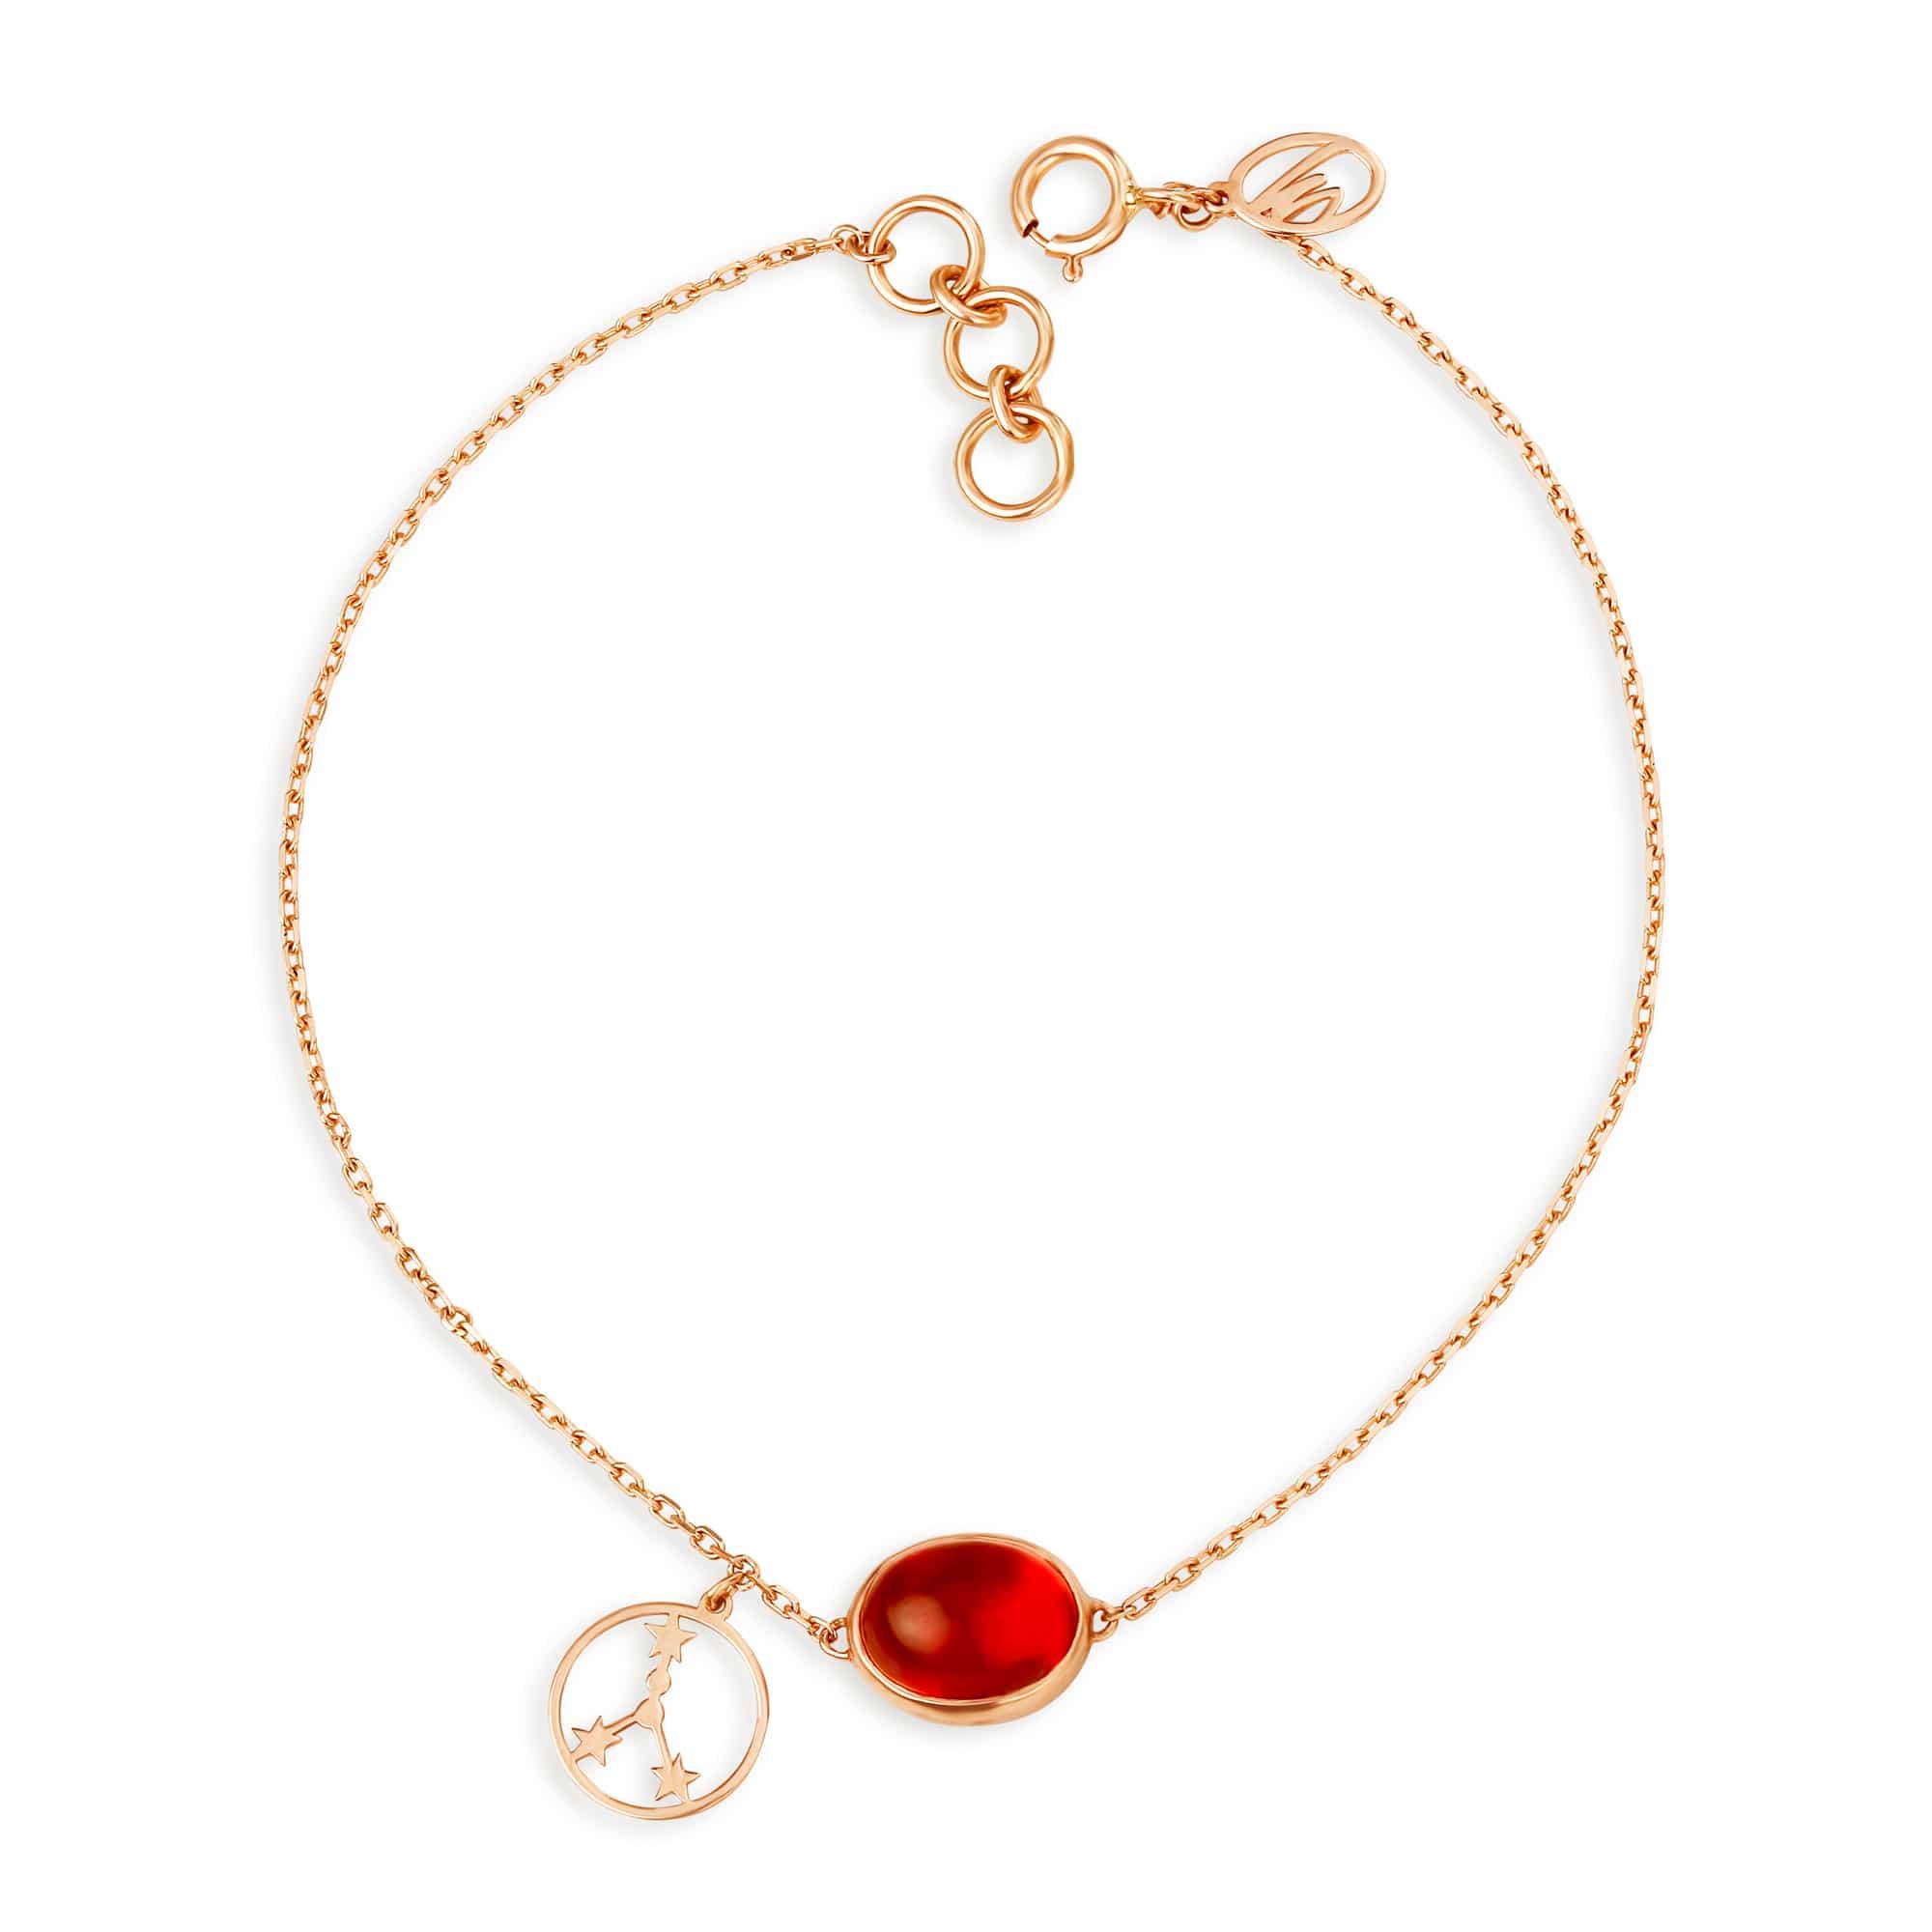 01bbf82930771 Mia by Tanishq 14KT Cancer Birthstone Rose Gold Bracelet